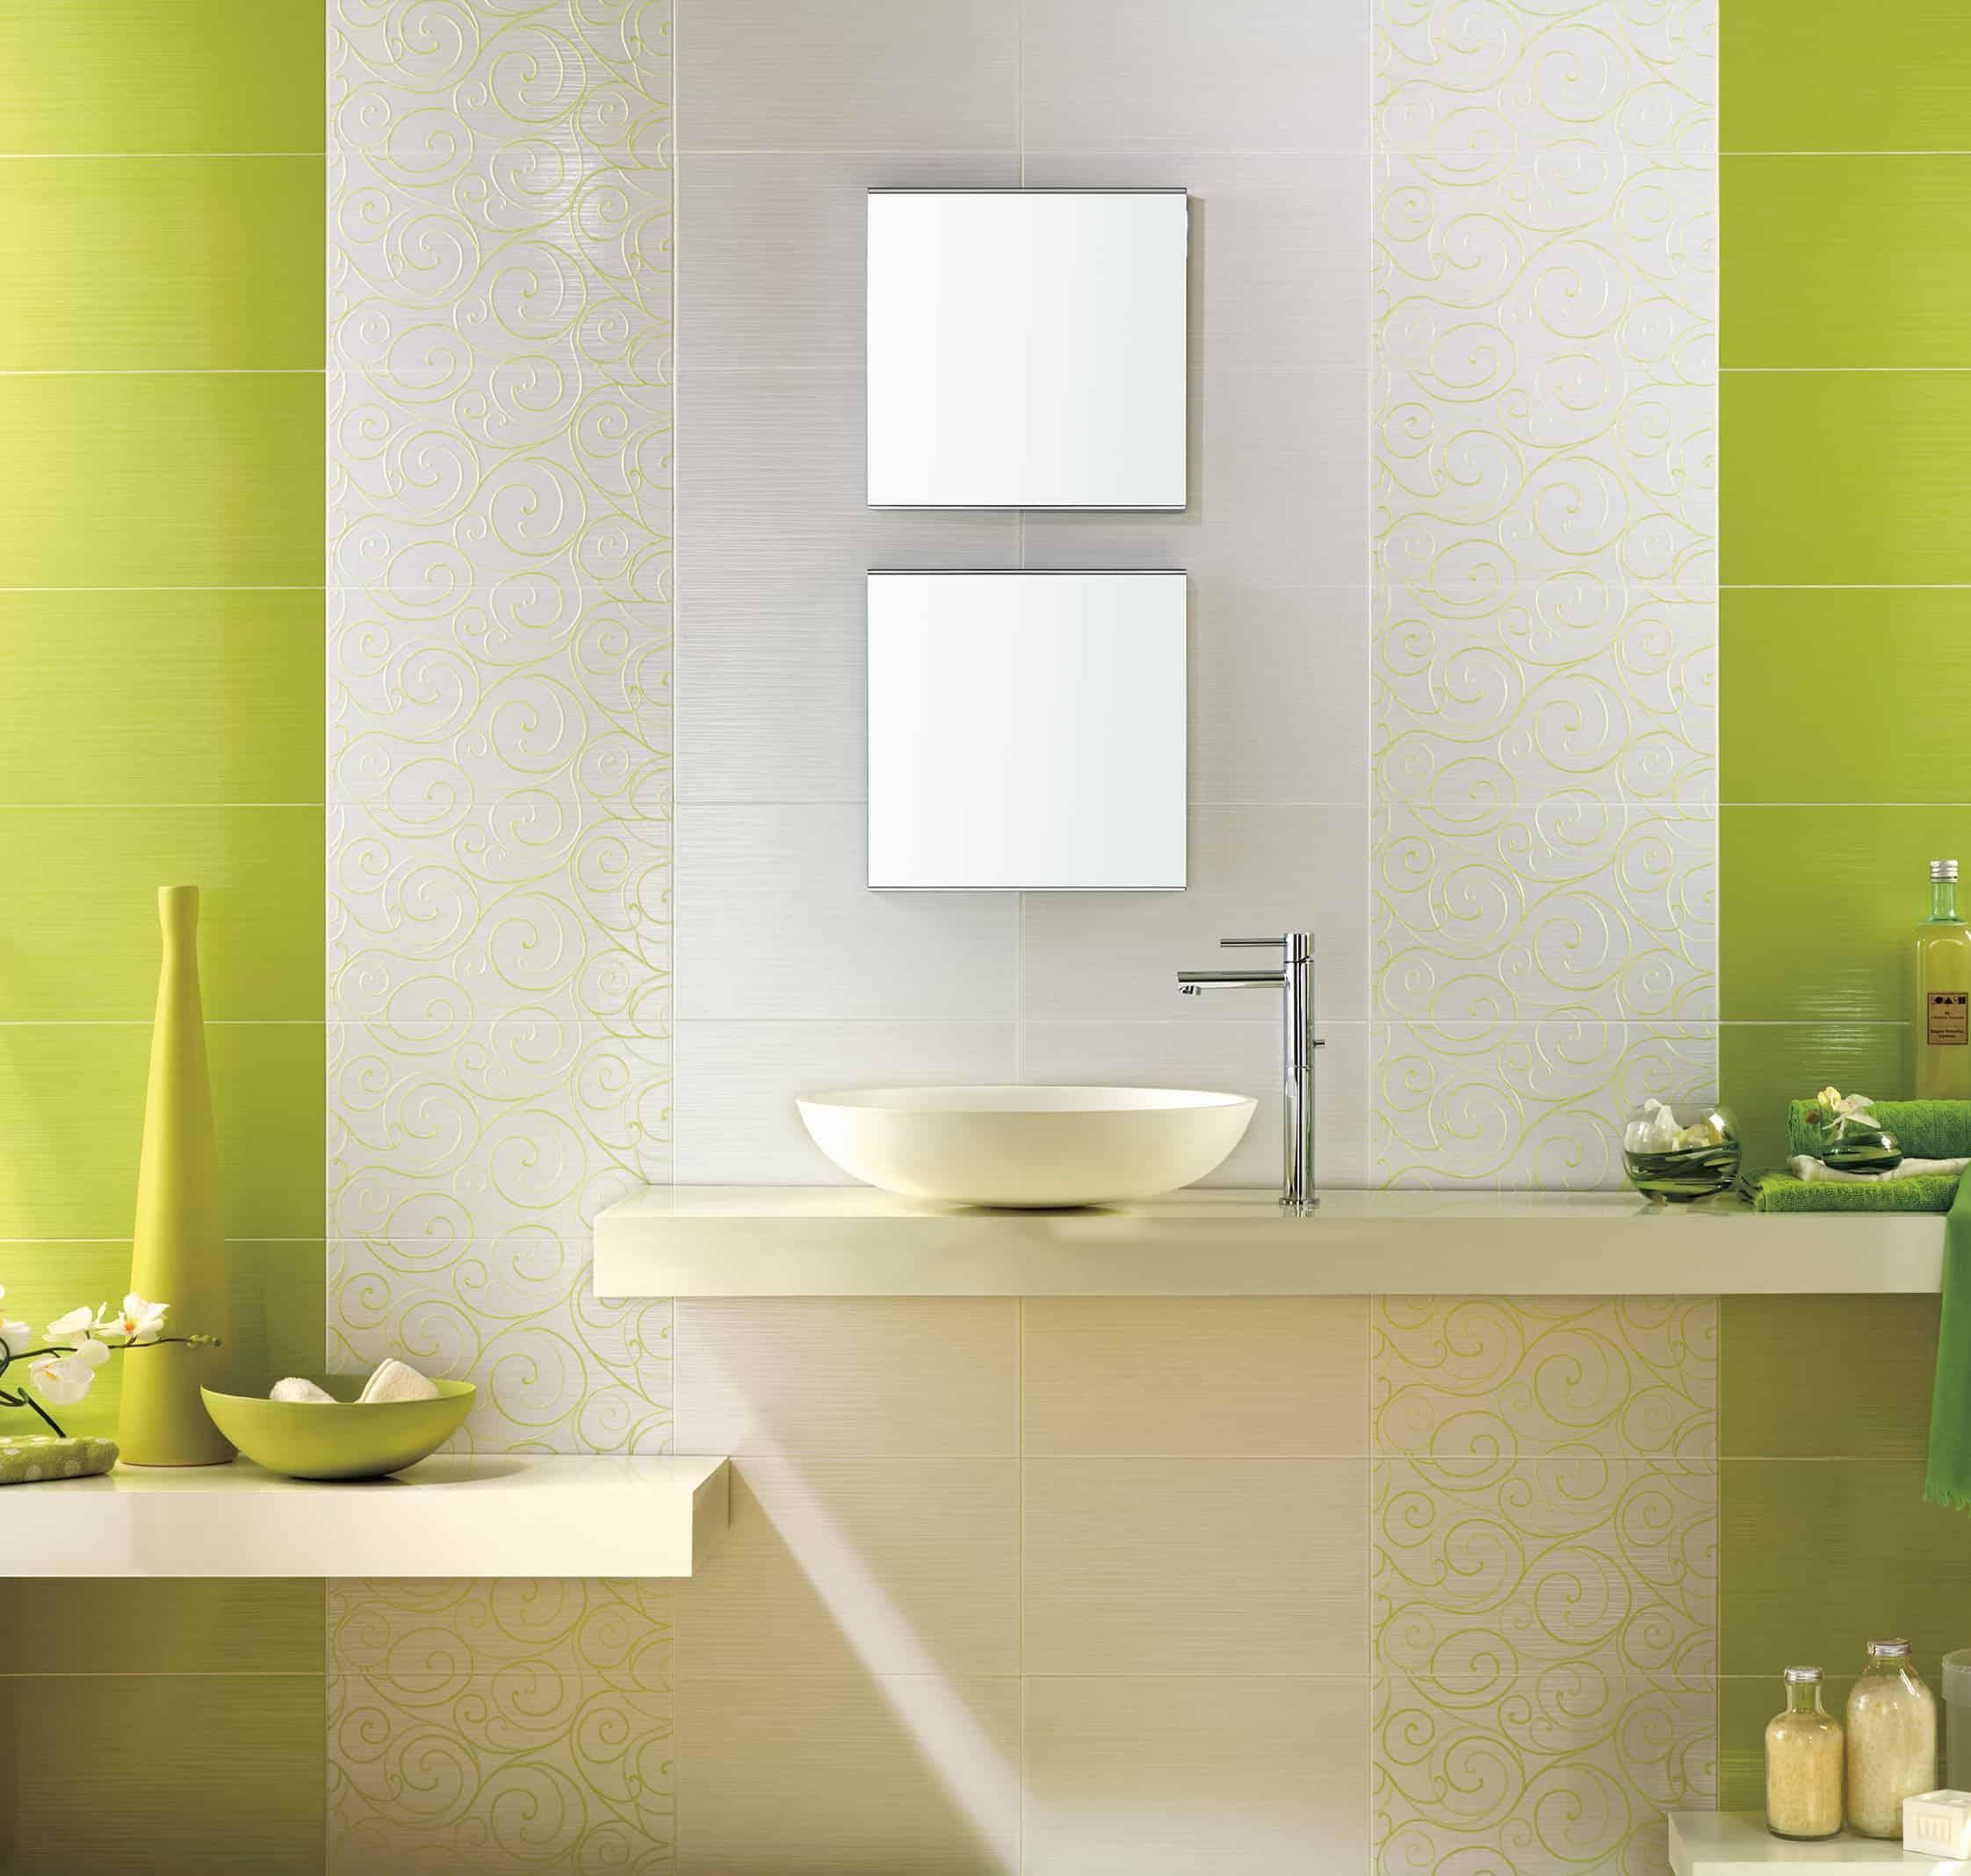 Serie spring rivestimenti musis - Rivestimento bagno design ...